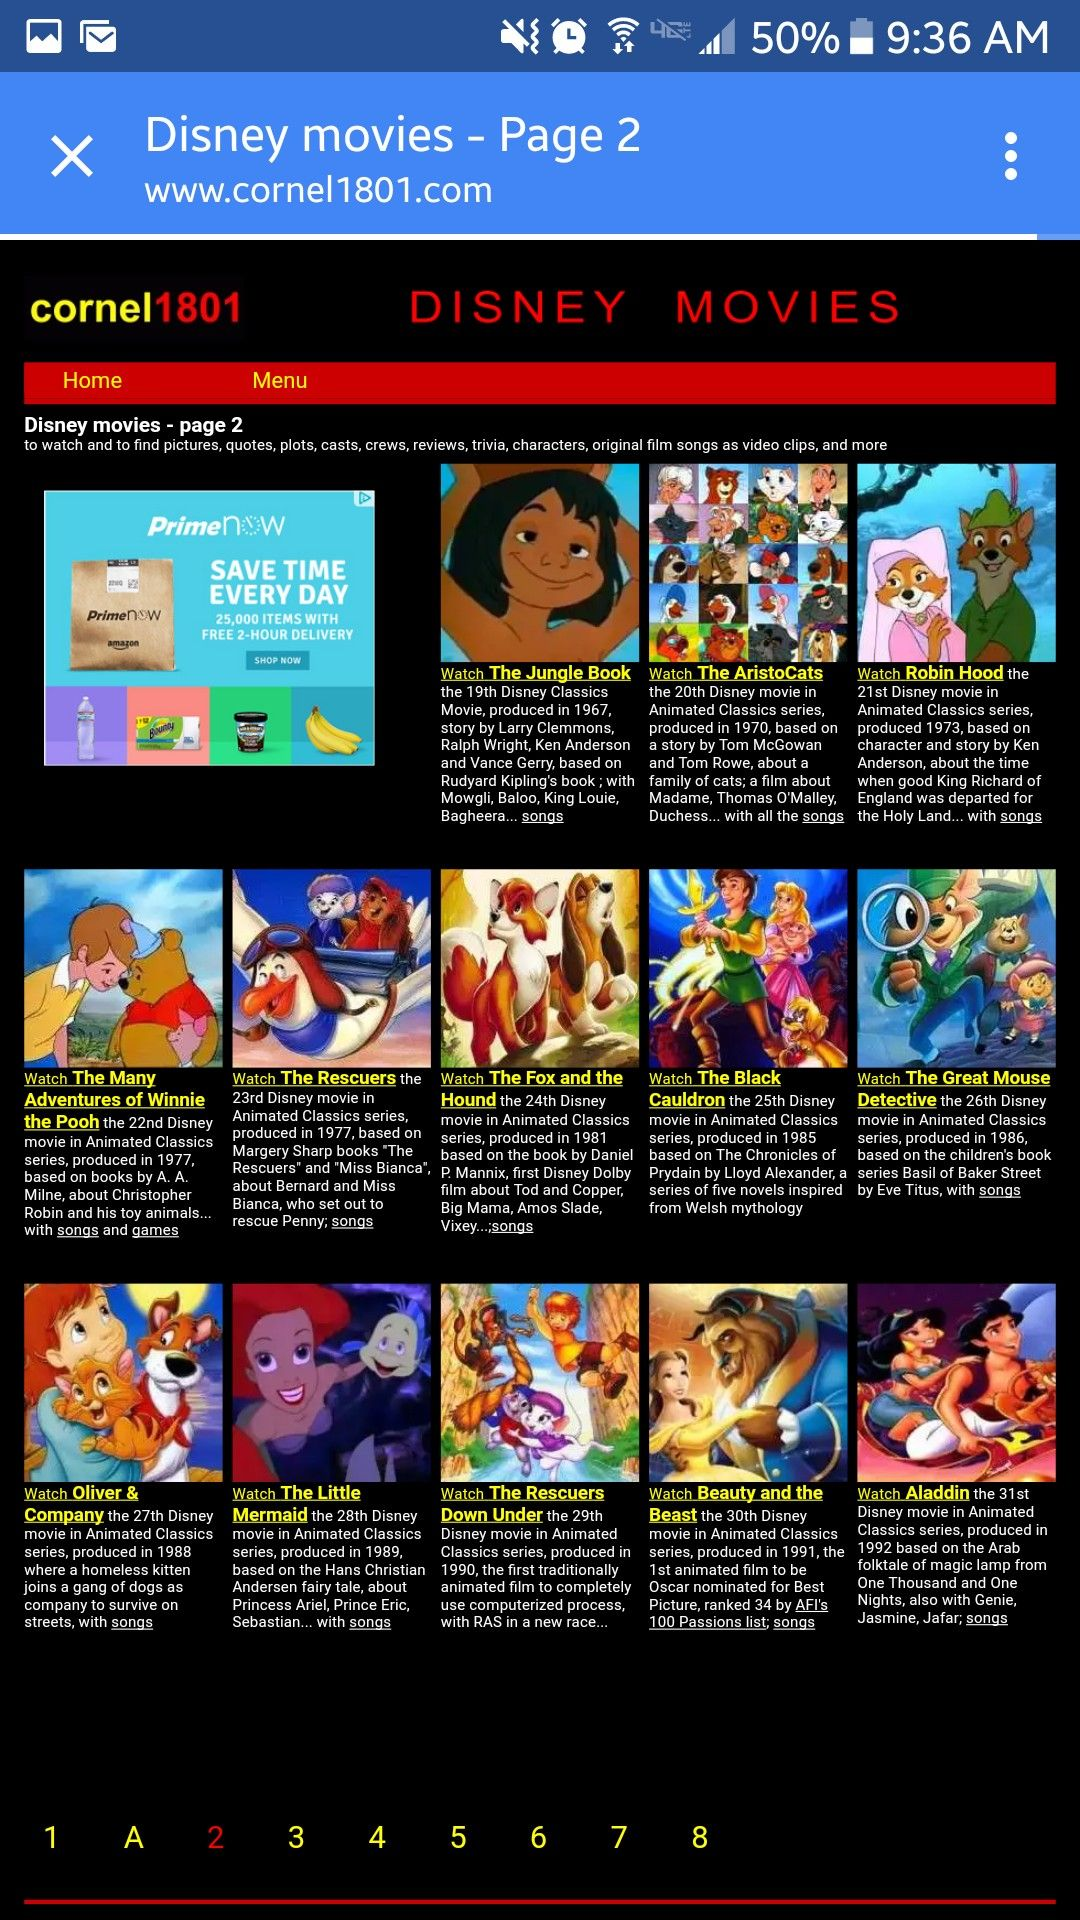 Cornel1801 Com Disney Movies Html Stream All The Old Disney Movies For Free Disney Movies Disney Movies Online Classic Disney Movies